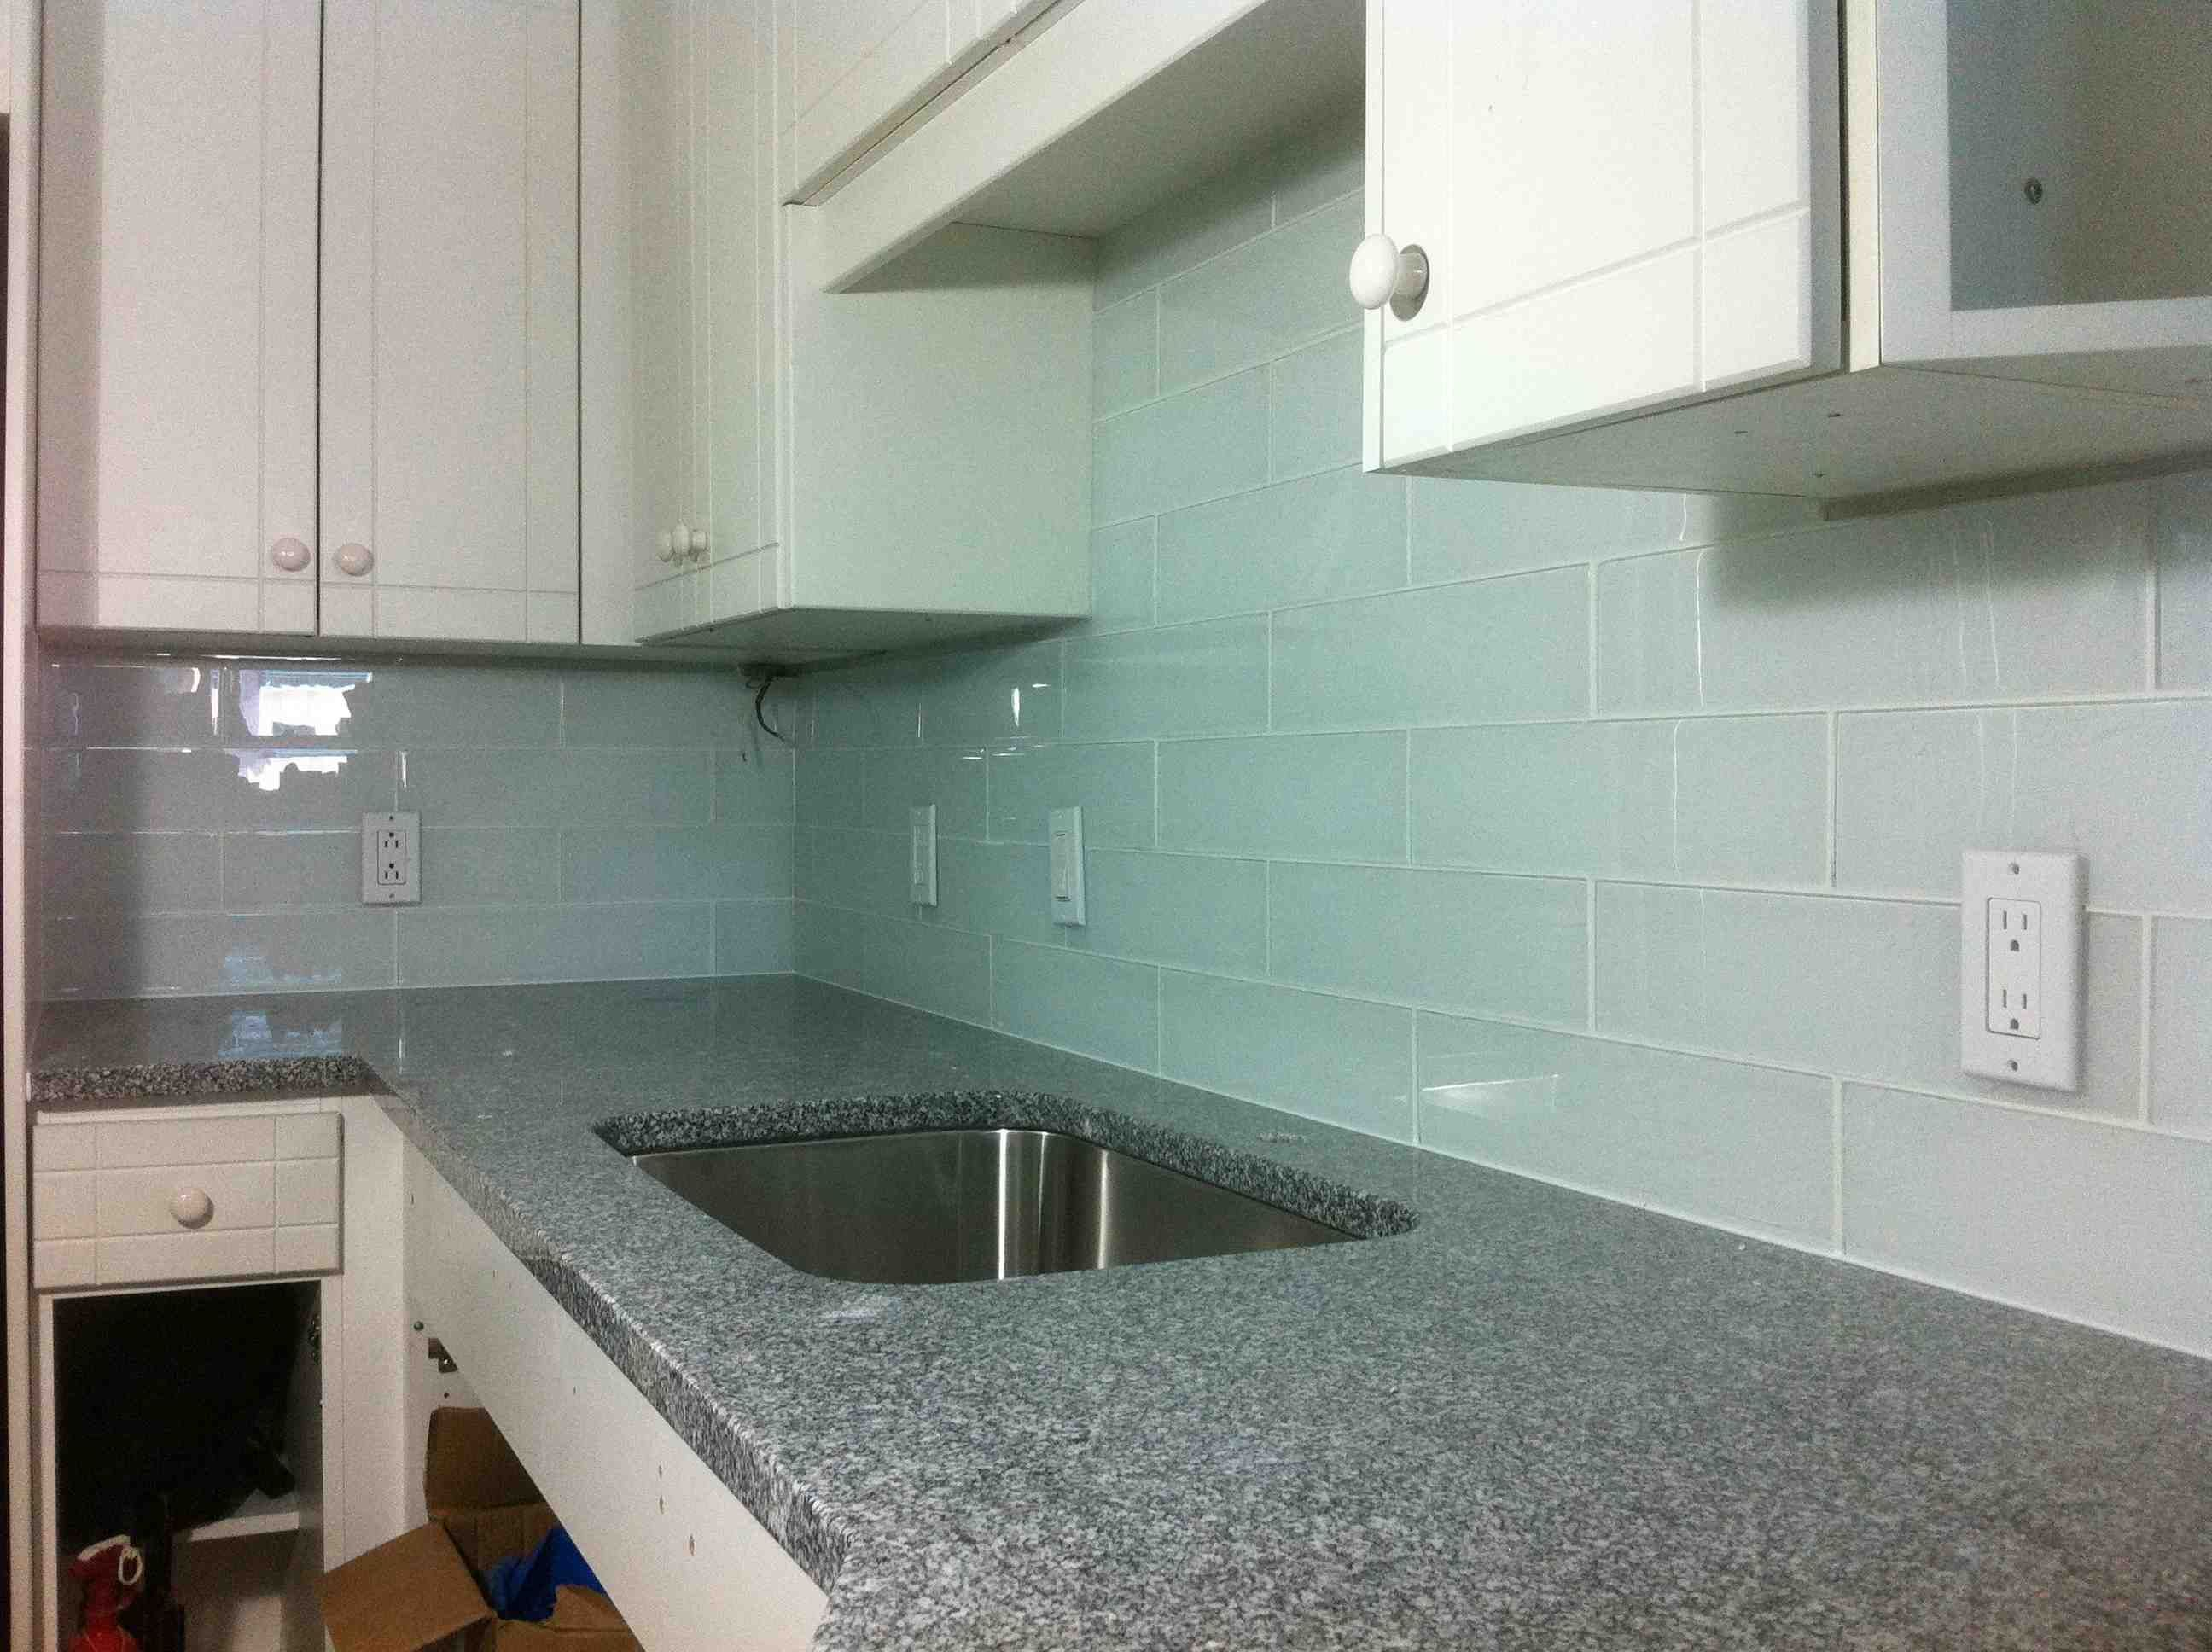 Halifax Tile Installer Modern Kitchen Tile Backsplash Modern Kitchen Tiles Glass Backsplash Kitchen